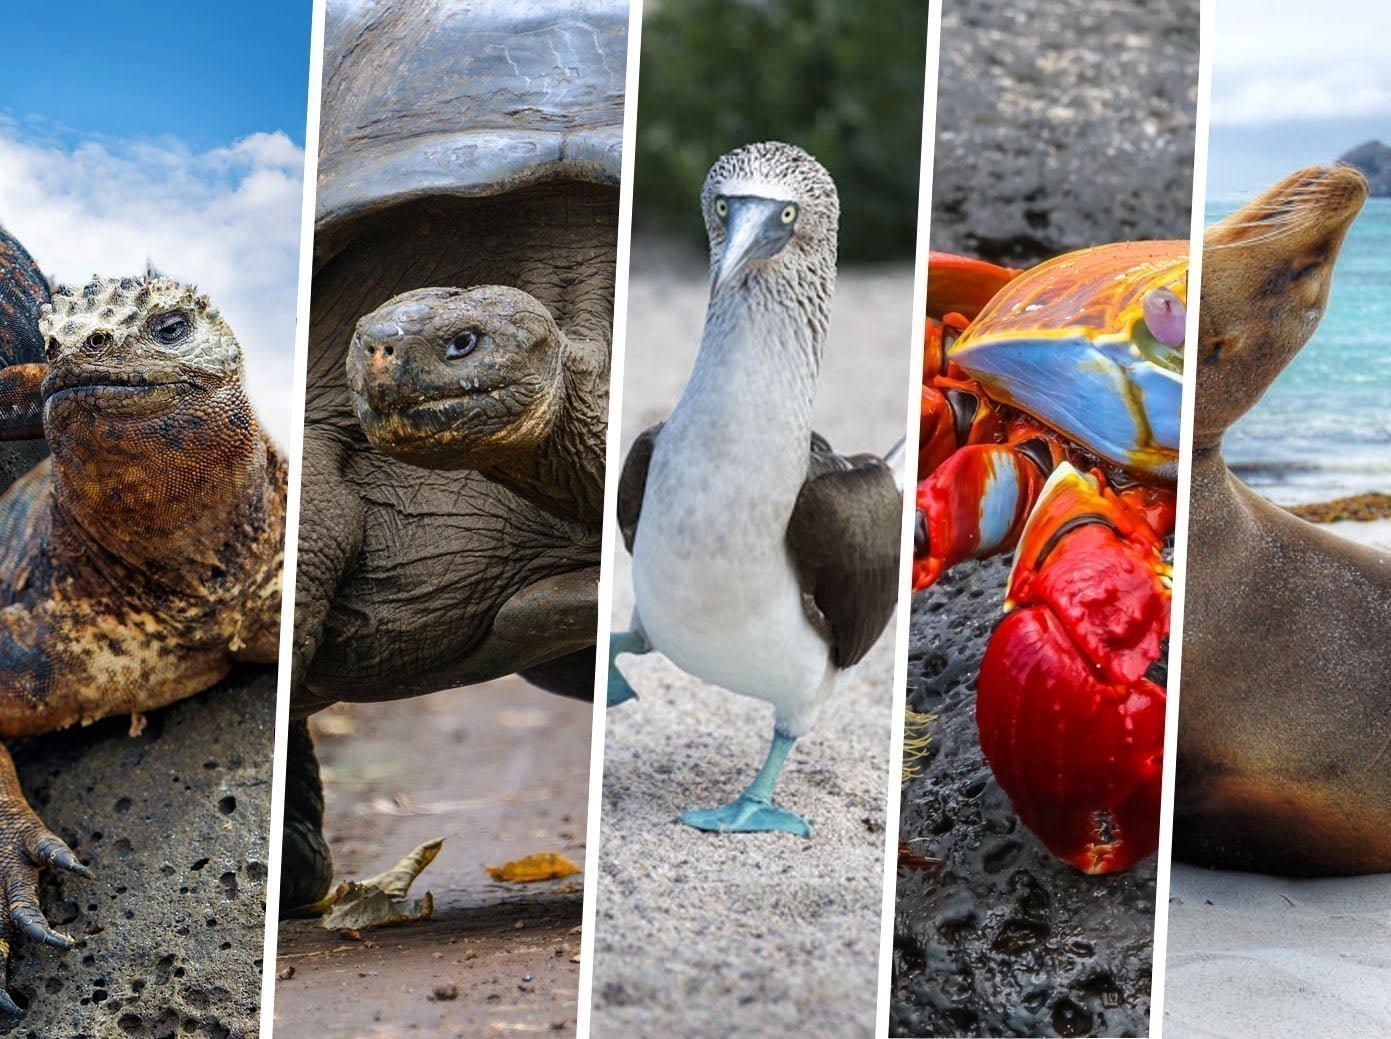 Les Animaux des îles Galapagos